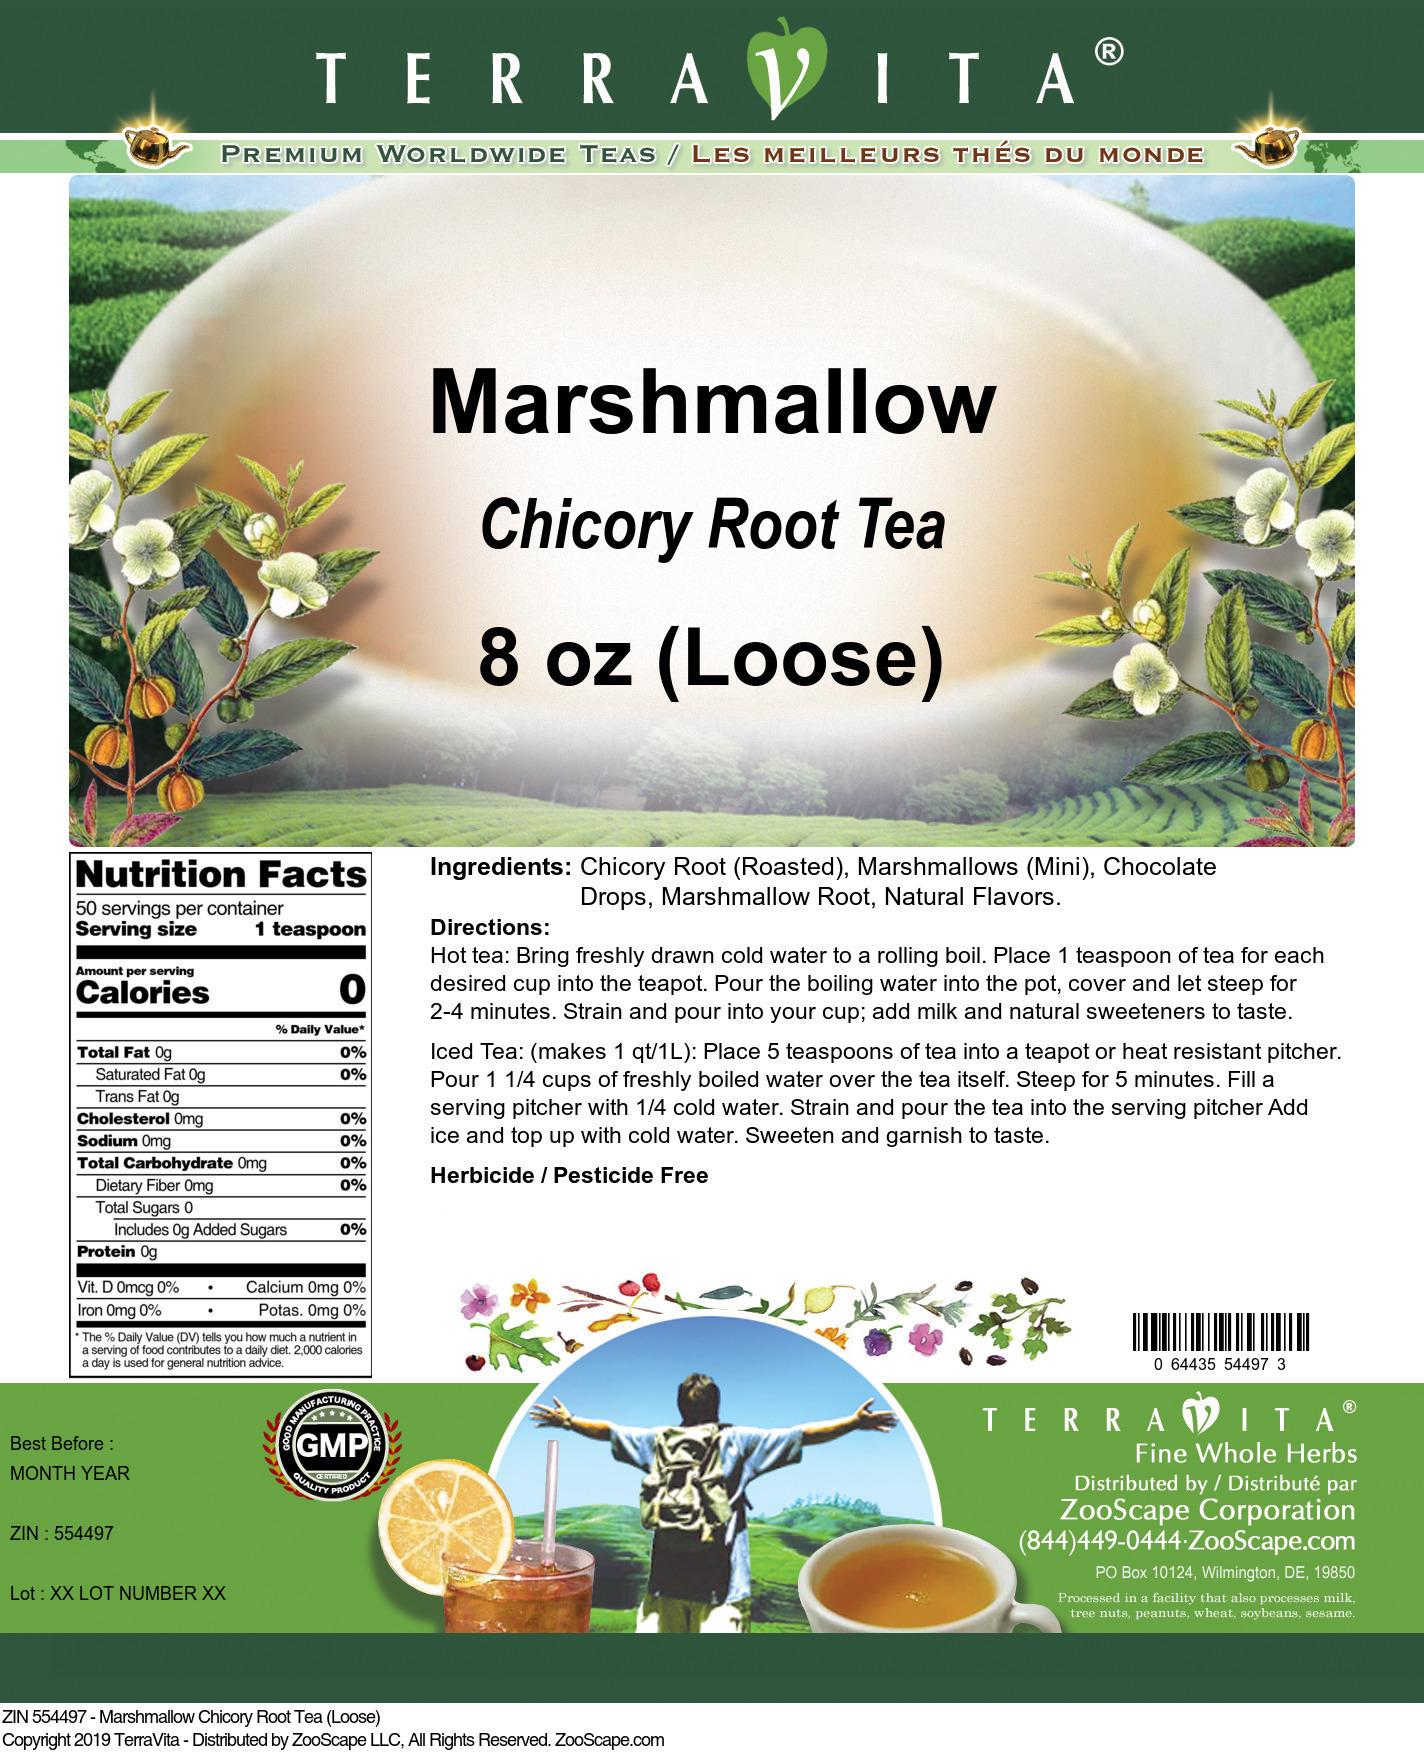 Marshmallow Chicory Root